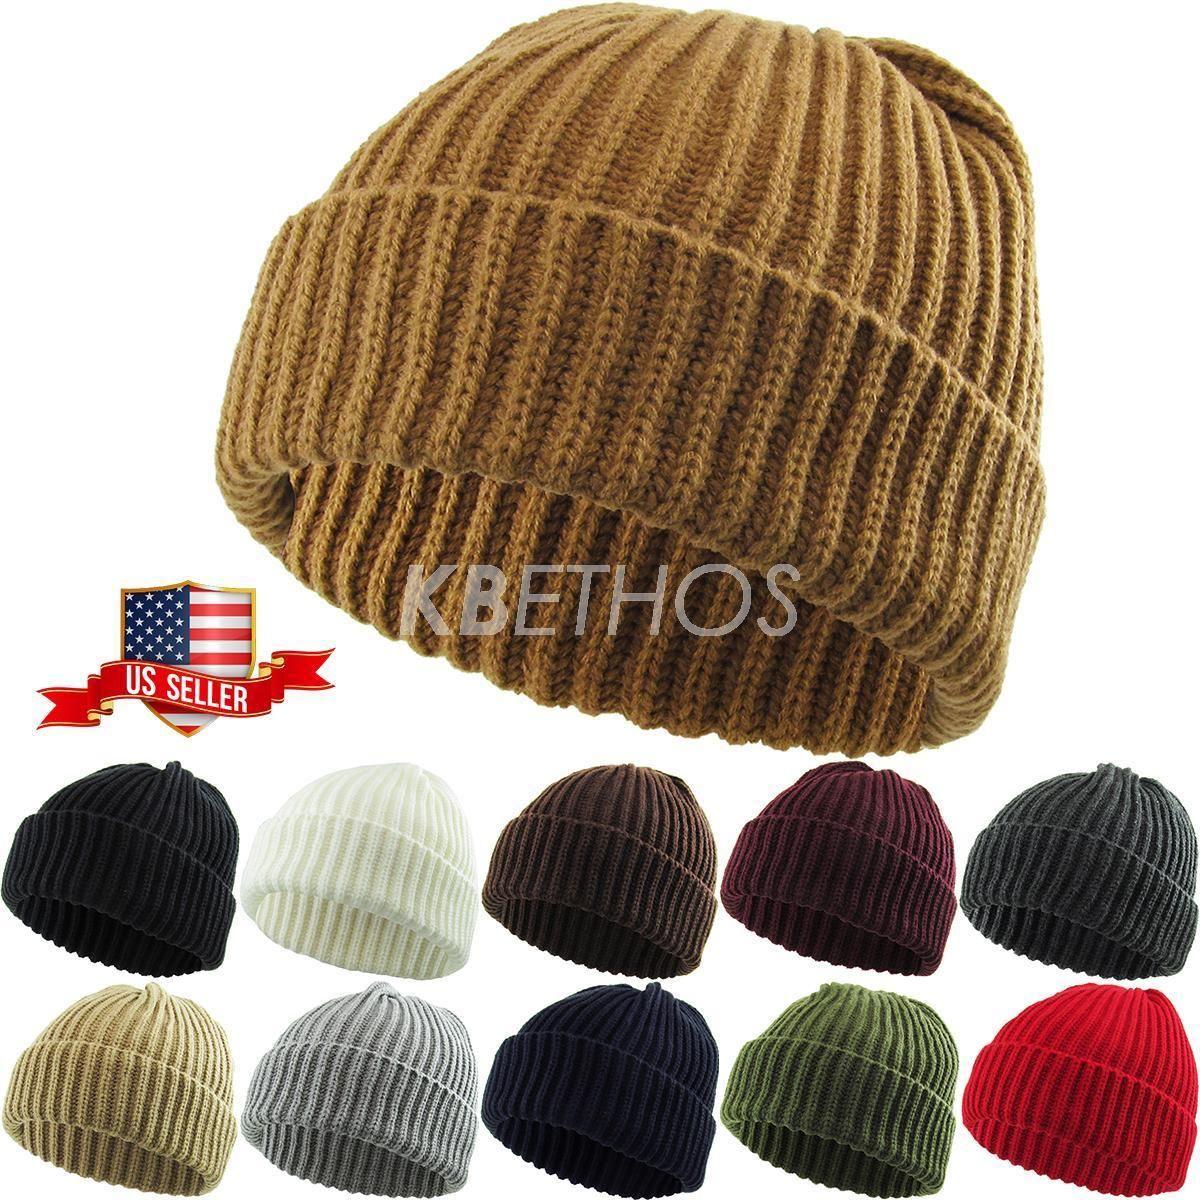 b8da55f34fddc THICK Ribbed Beanie Knit Ski Cap Skull Hat Warm Solid Color Winter Cuff  Blank